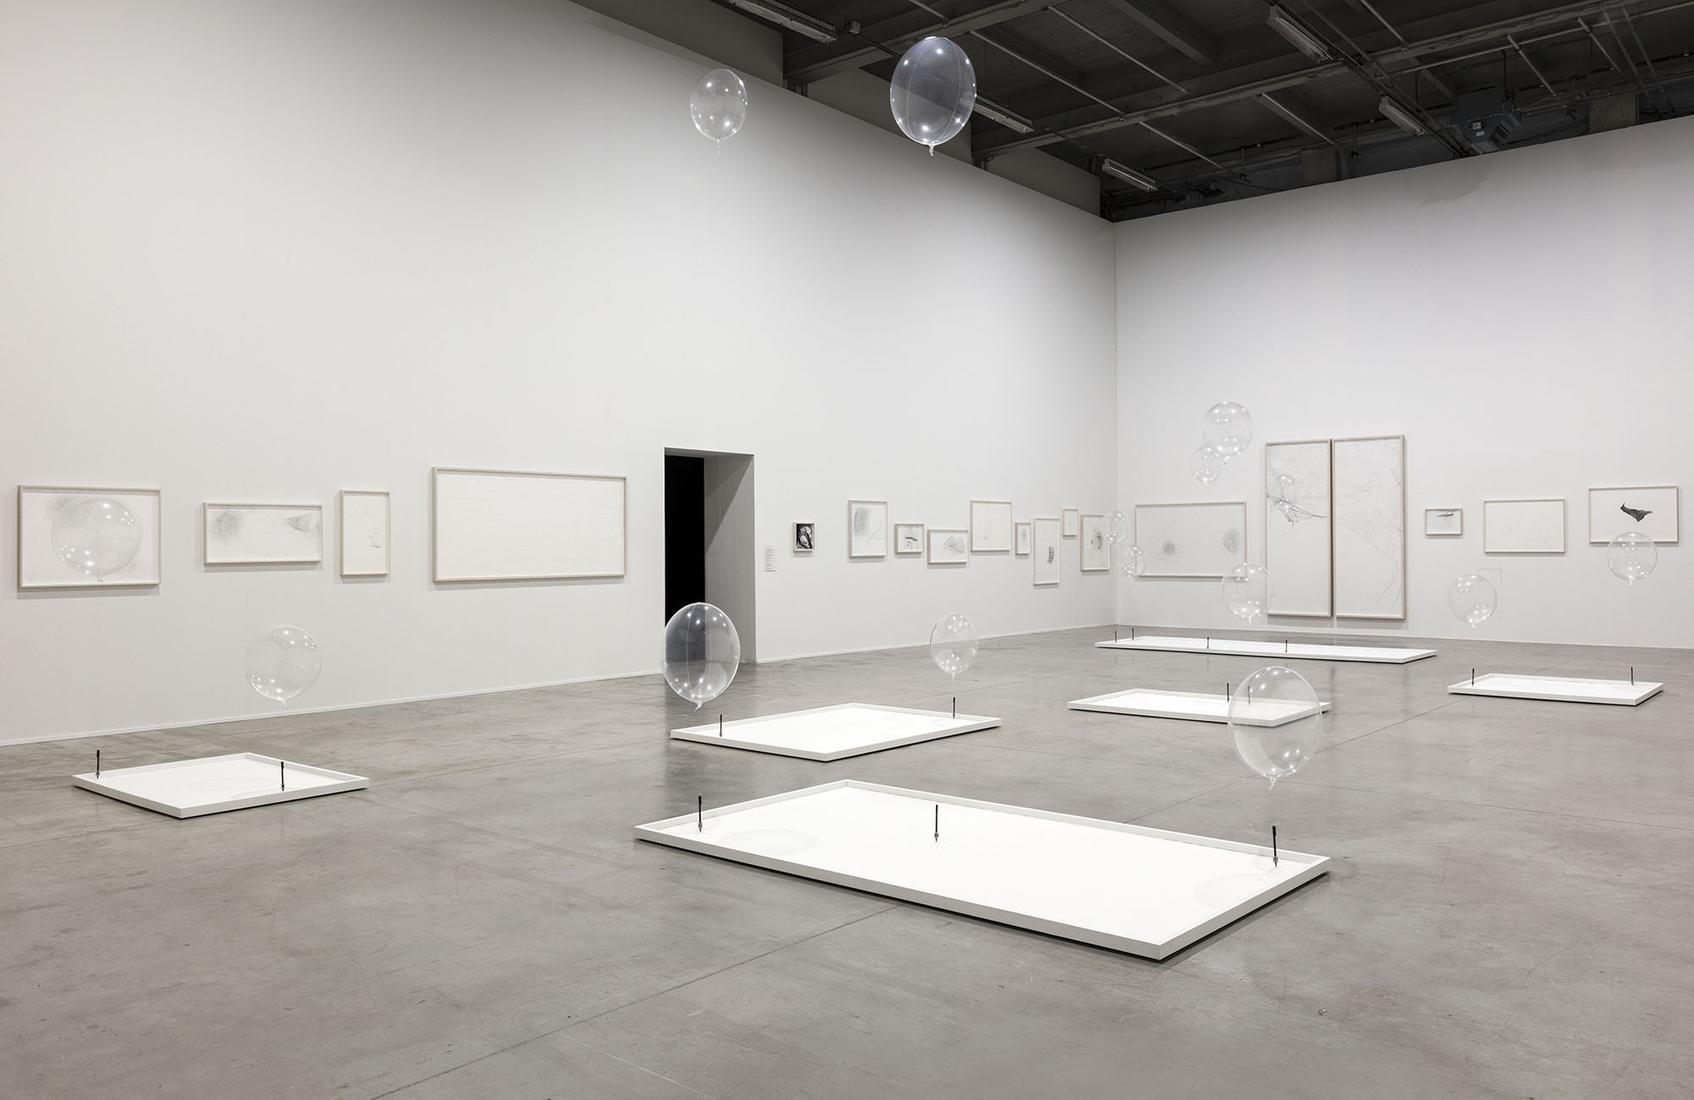 October 15, 2018 - January 6, 2019 - Palais de Tokyo, Paris - Tomás Saraceno: ON AIR -  - Exhibitions